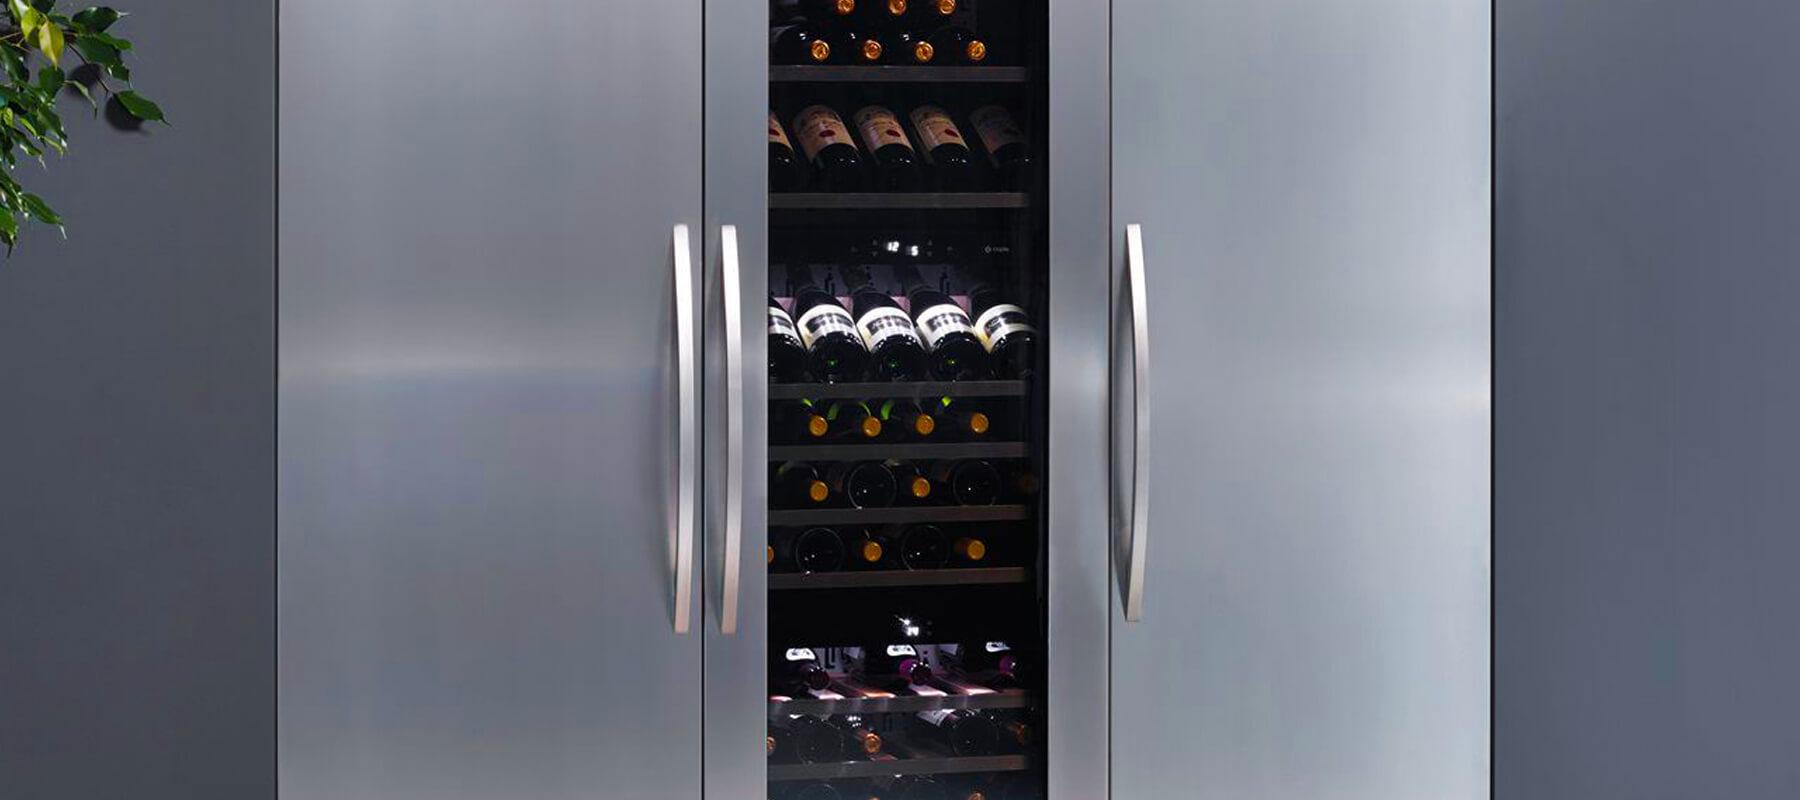 Built in Wine Refrigerator Poway | Built-in Refrigerator Repair